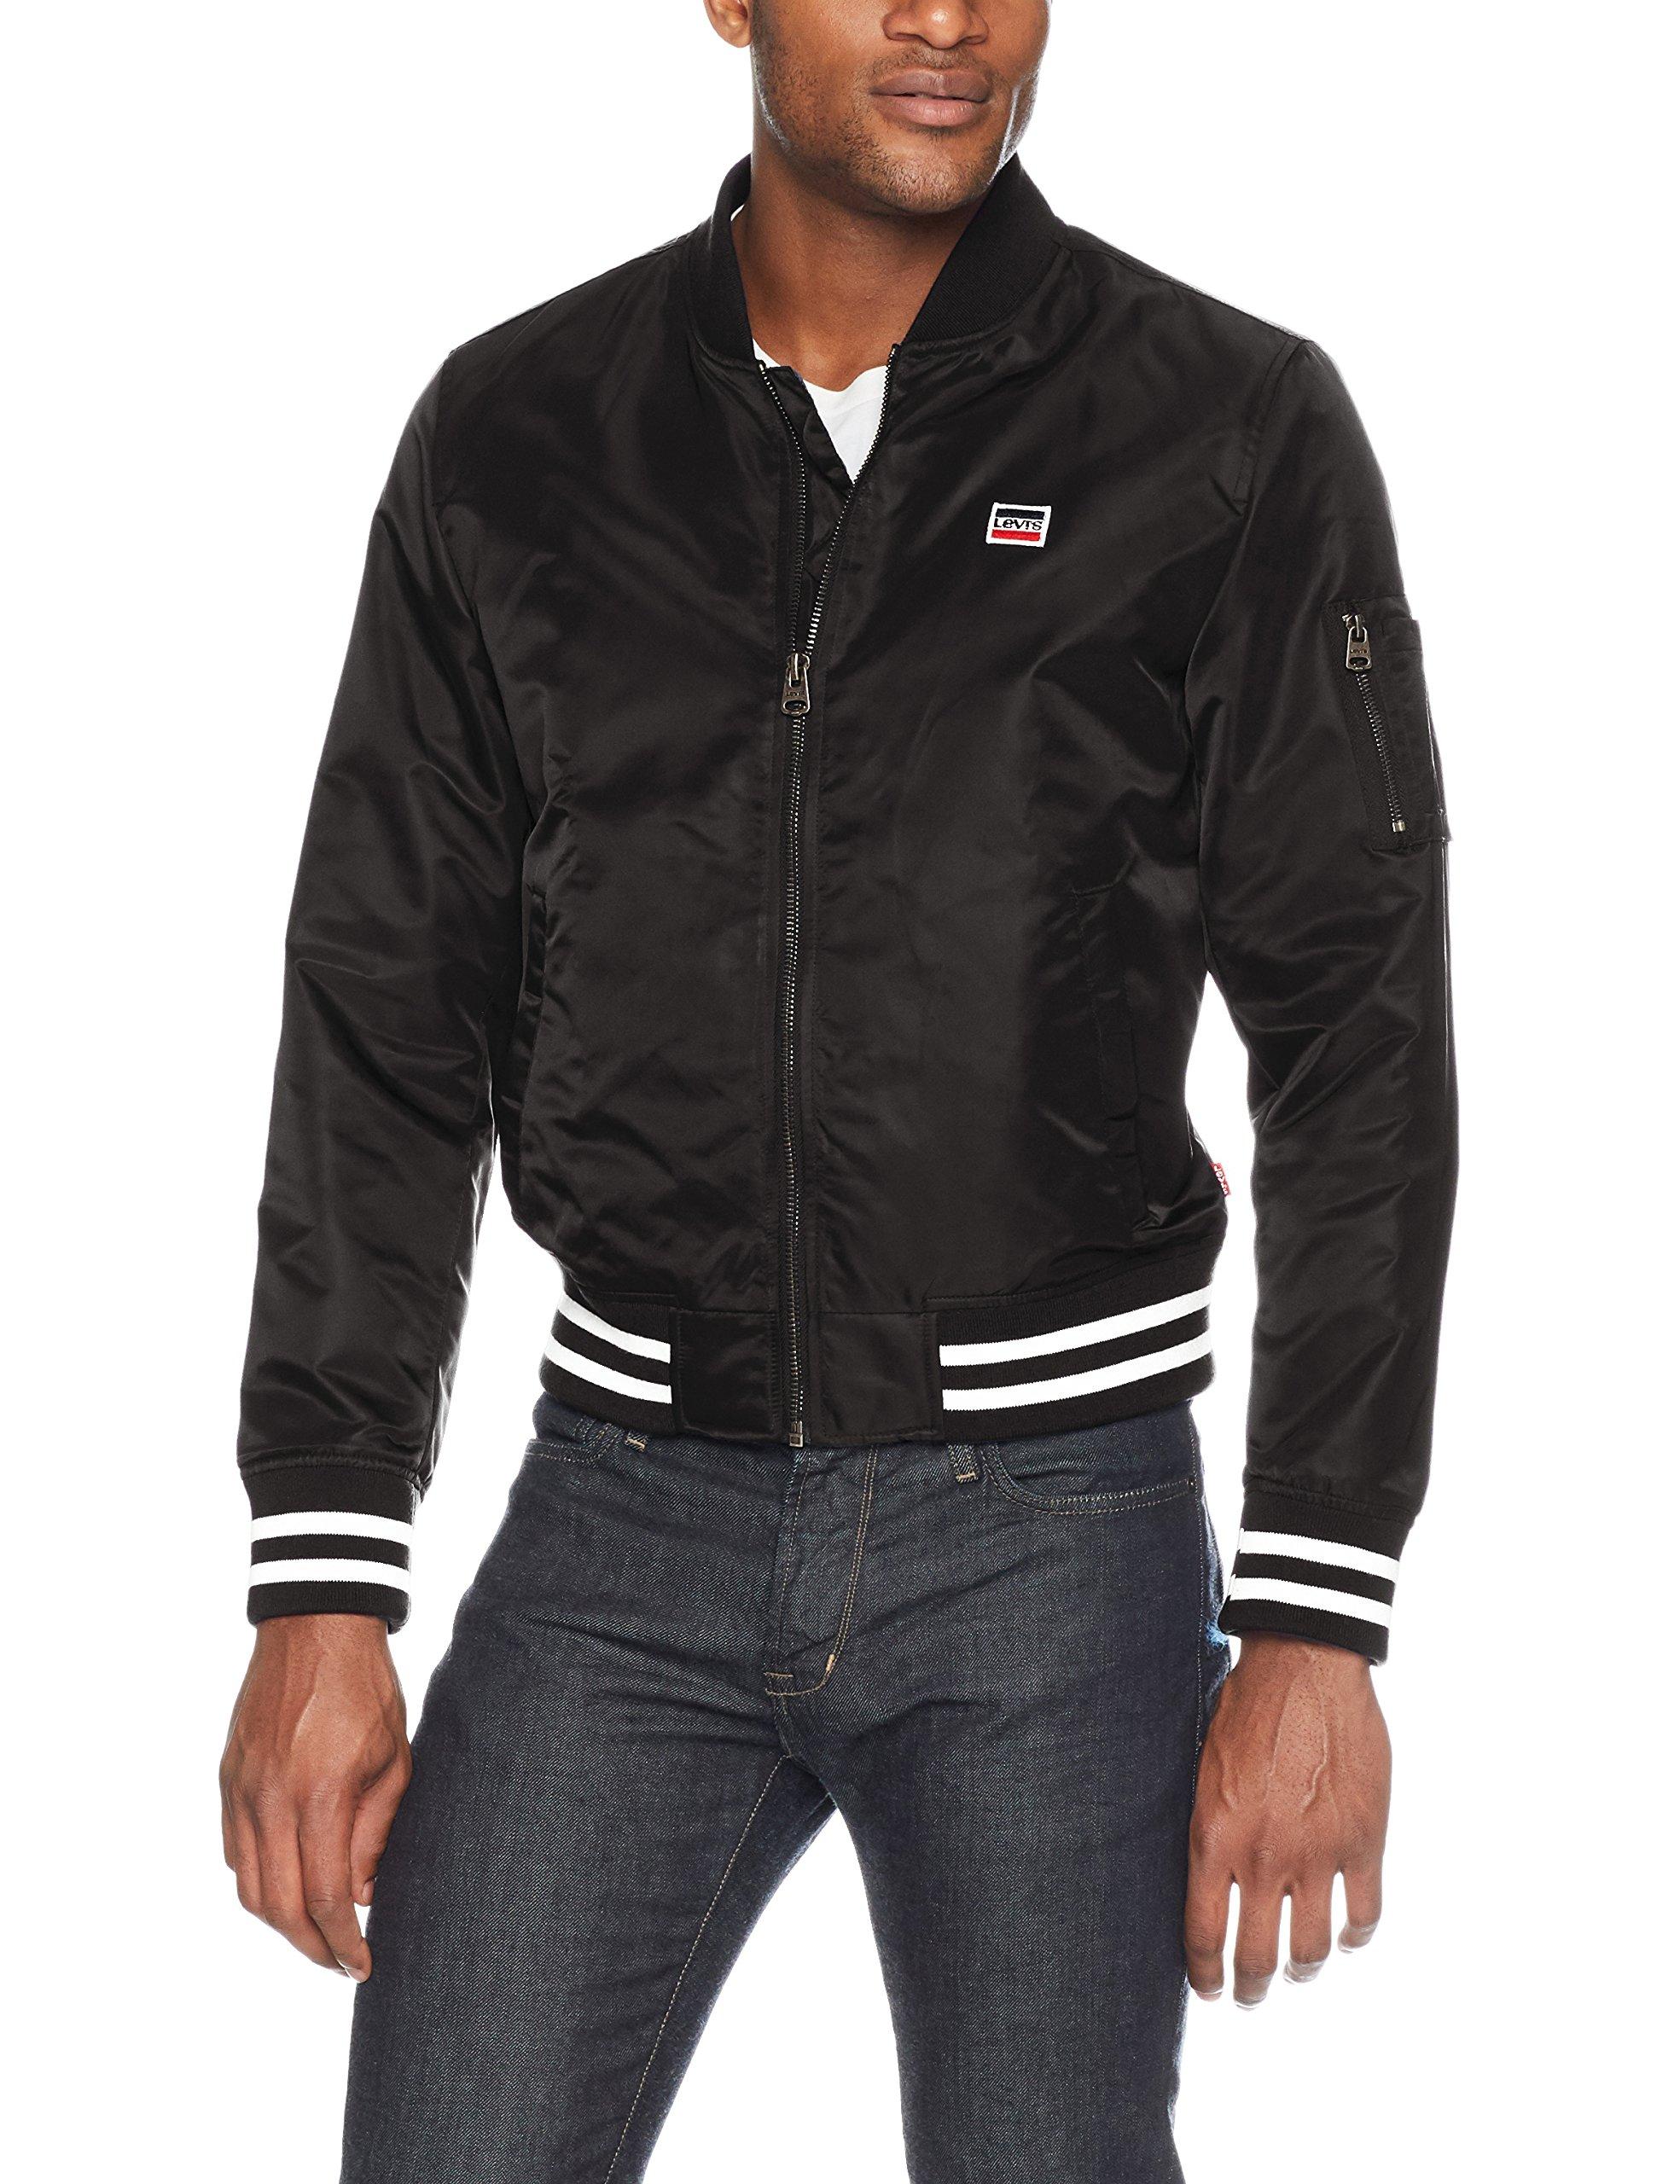 Levi's Men's Retro Varsity Bomber Jacket, Black, Small